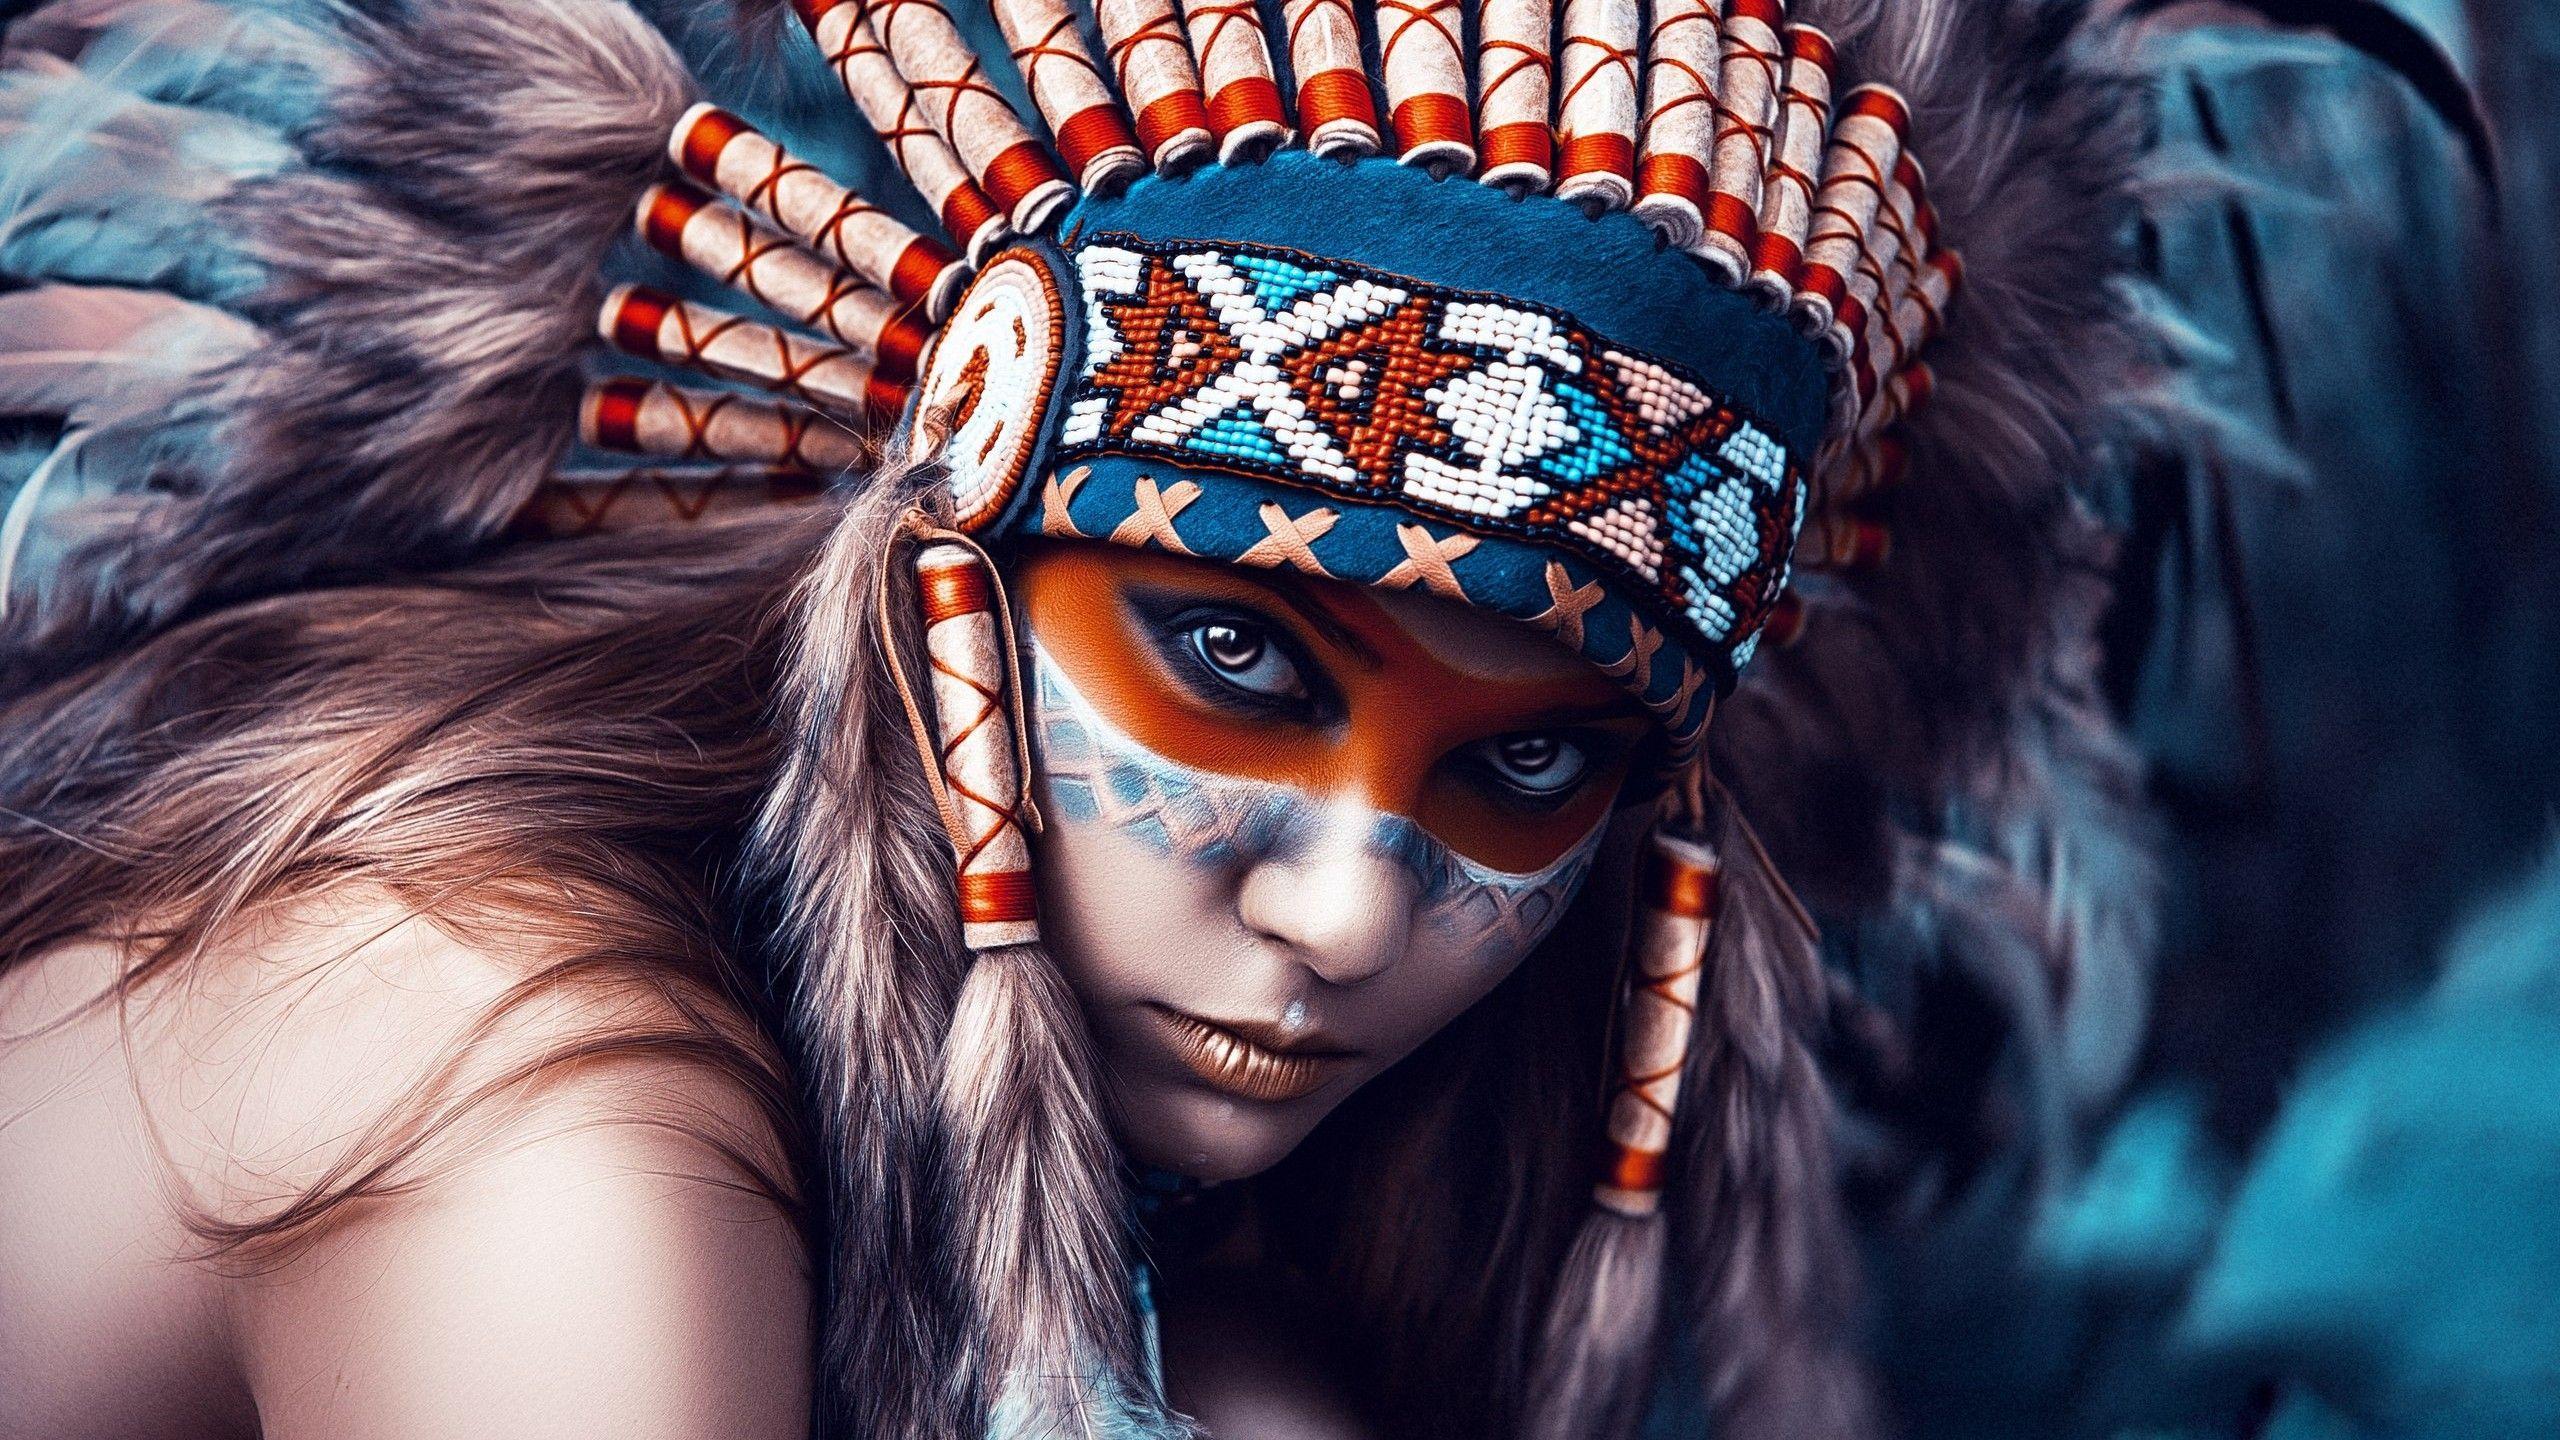 Native American Hd Wallpapers Top Free Native American Hd